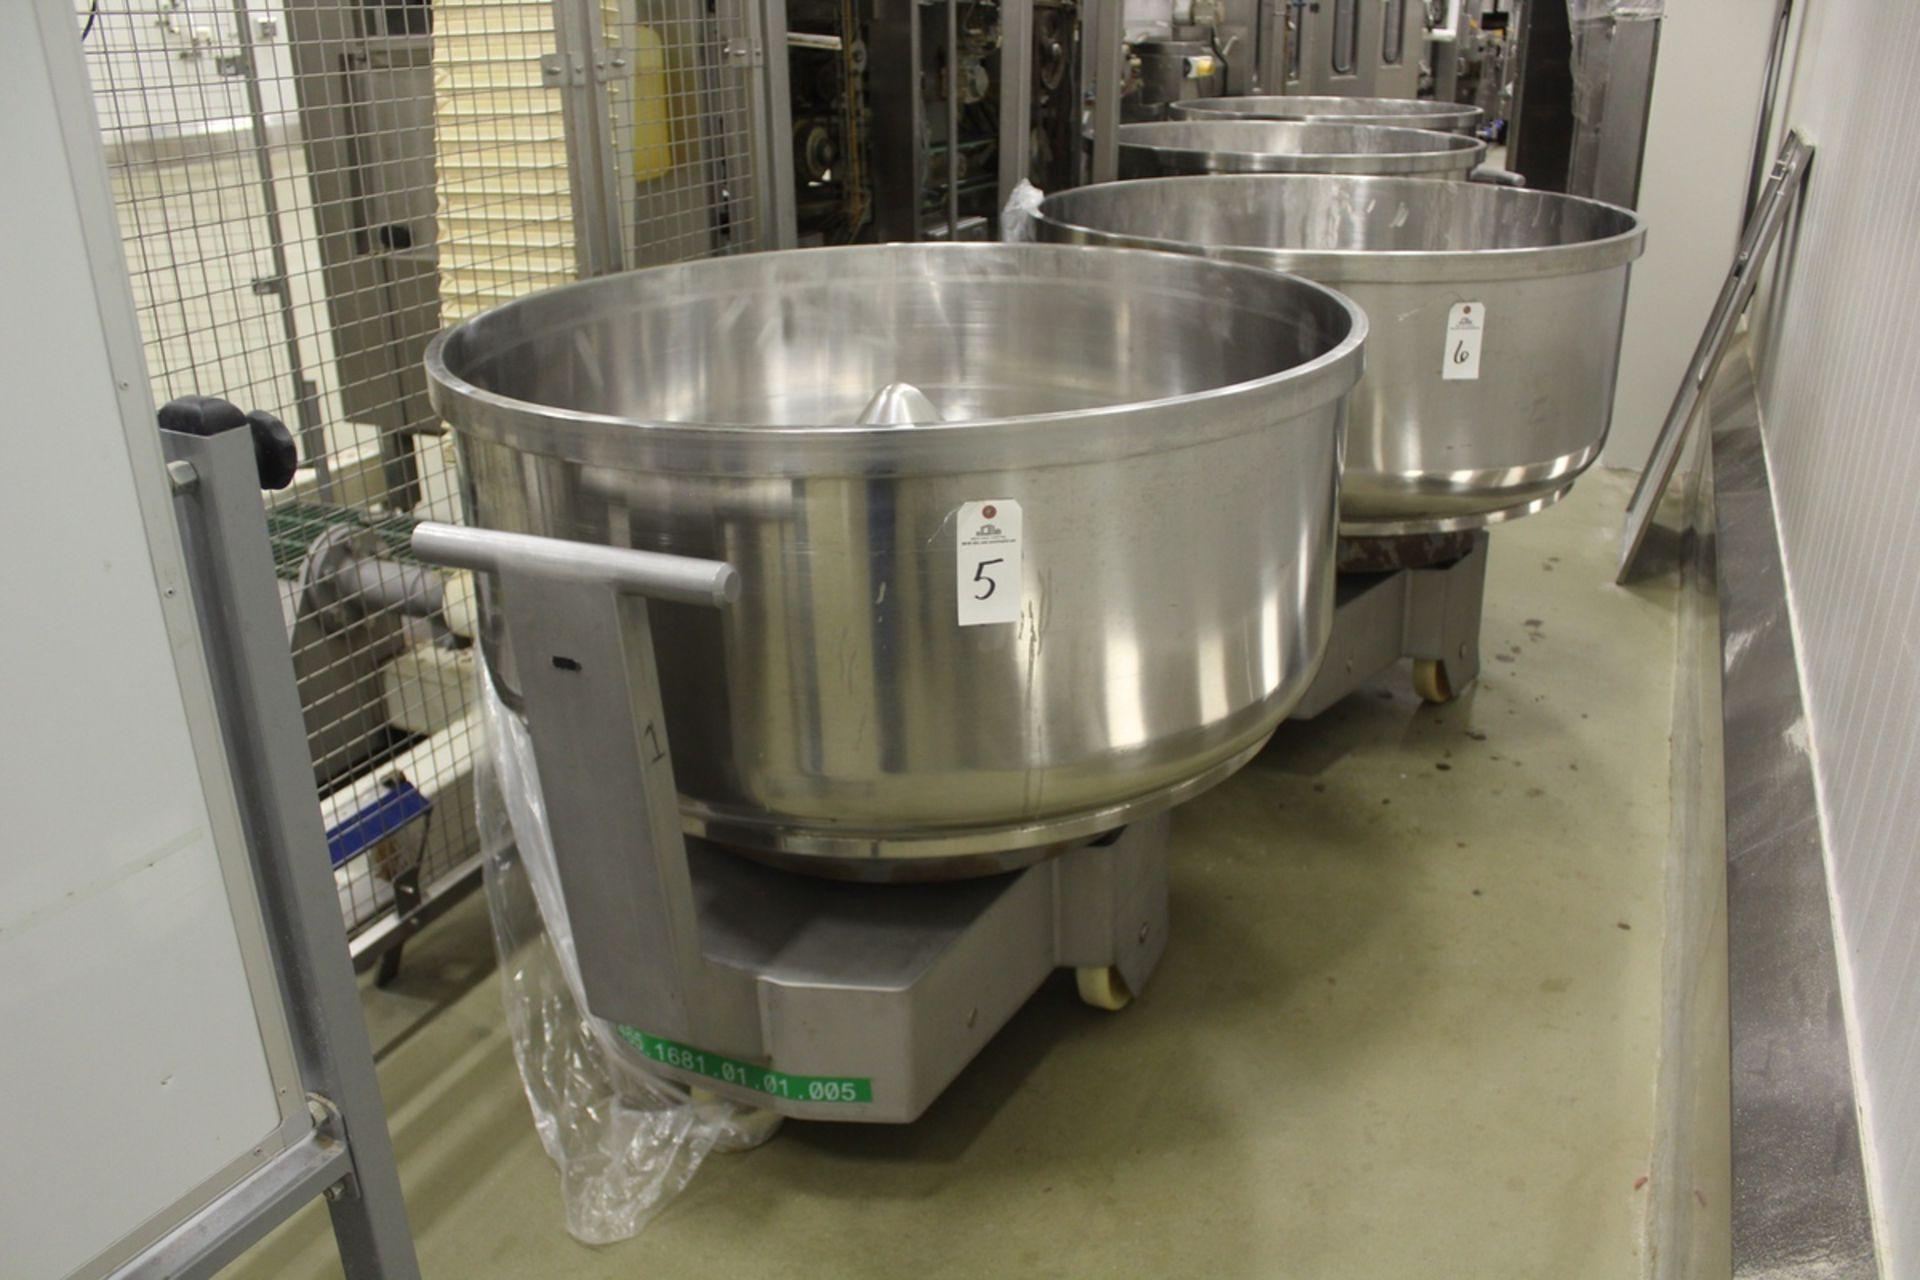 "Lot 5 - 2009 San Cassiano Planetary Mixing Bowl, 400/500 Kg. Capacity, 47"" I.D. X 21 1/2"" D | Rig Fee: $385"